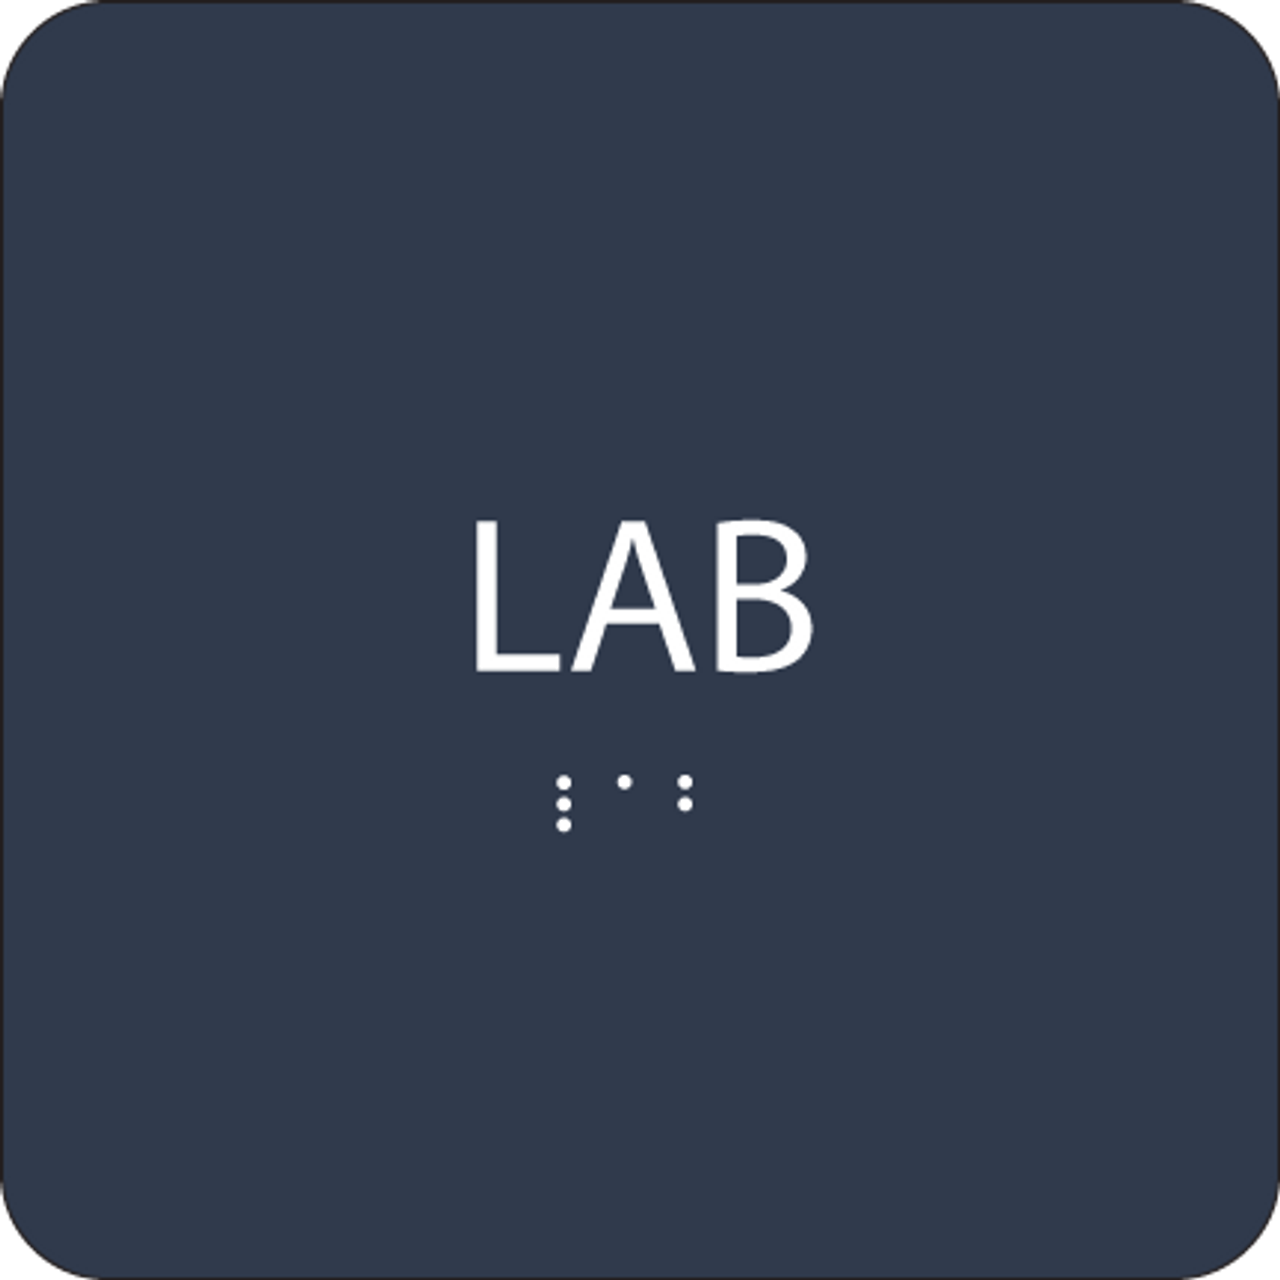 Blue Lab Braille Sign